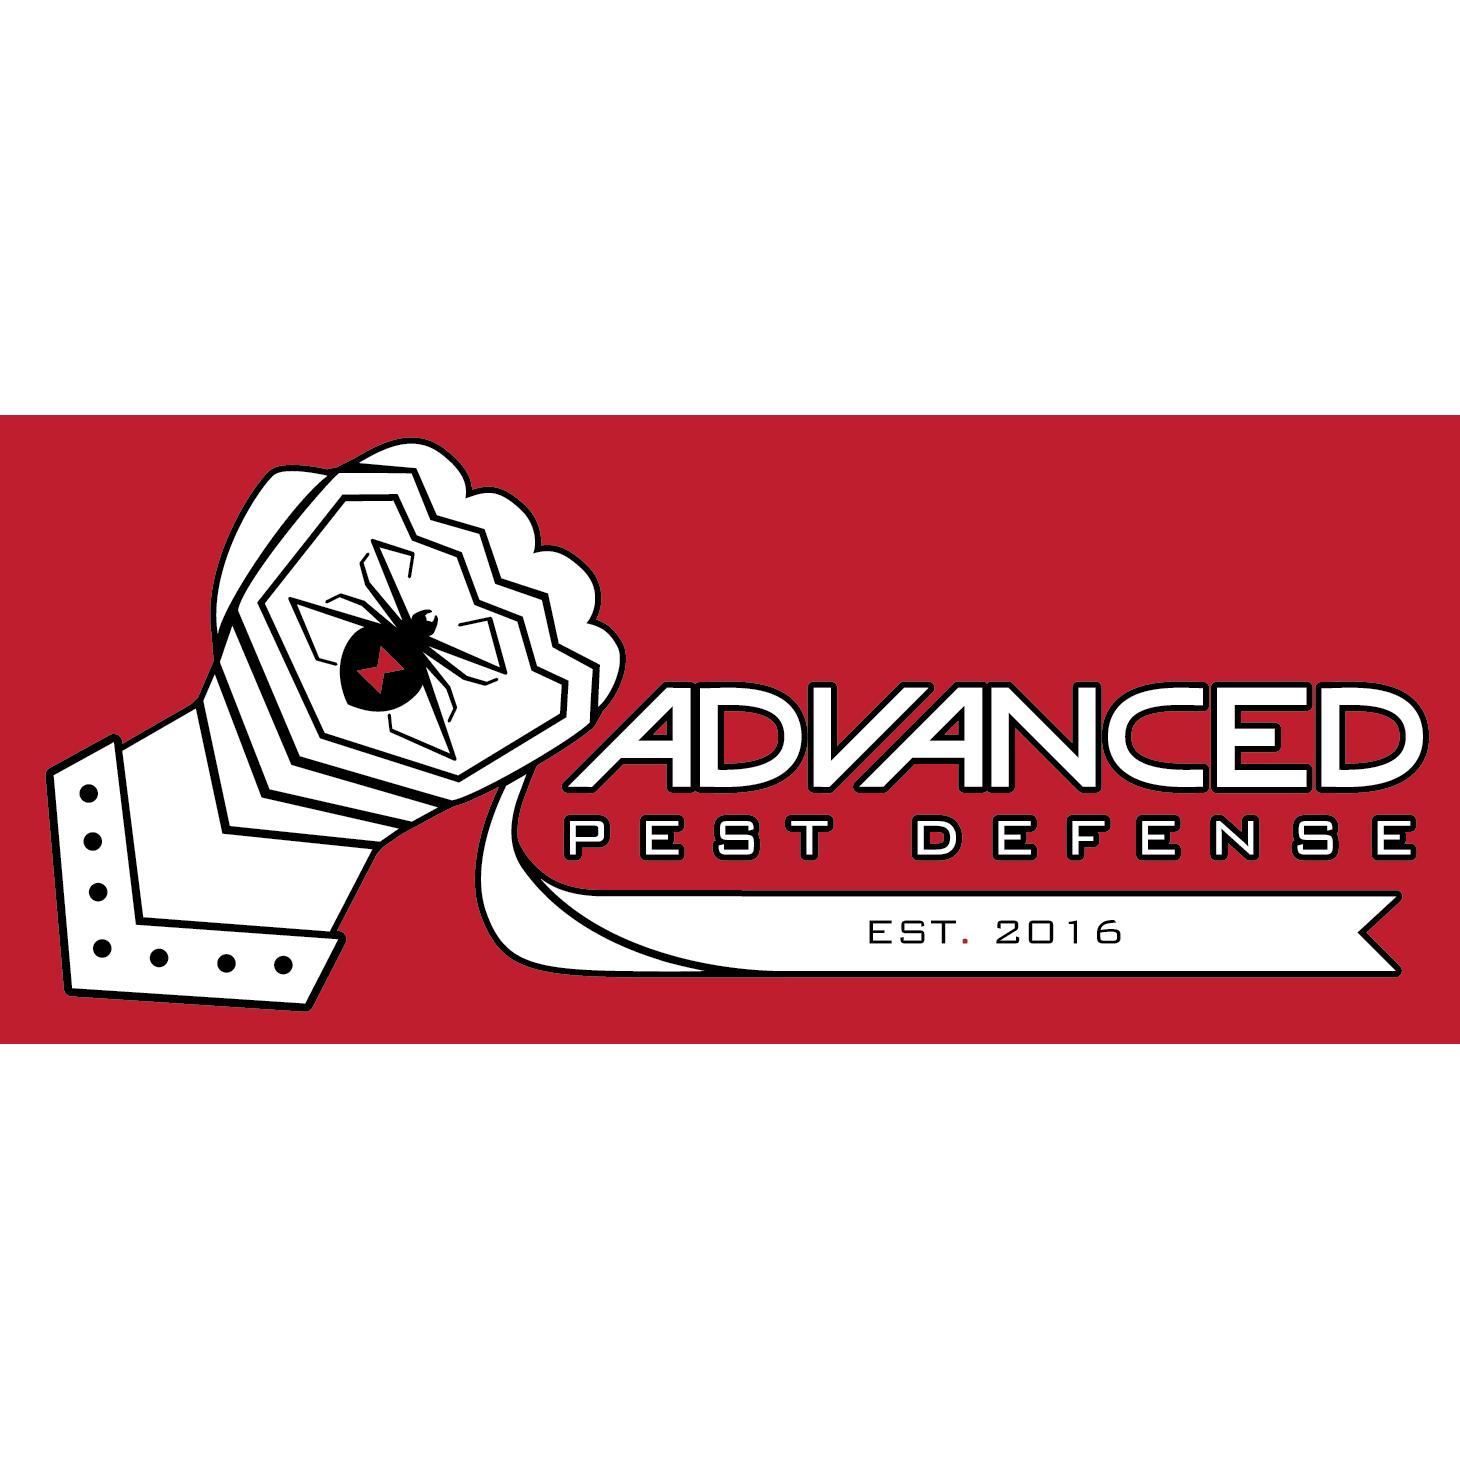 Advanced Pest Defense